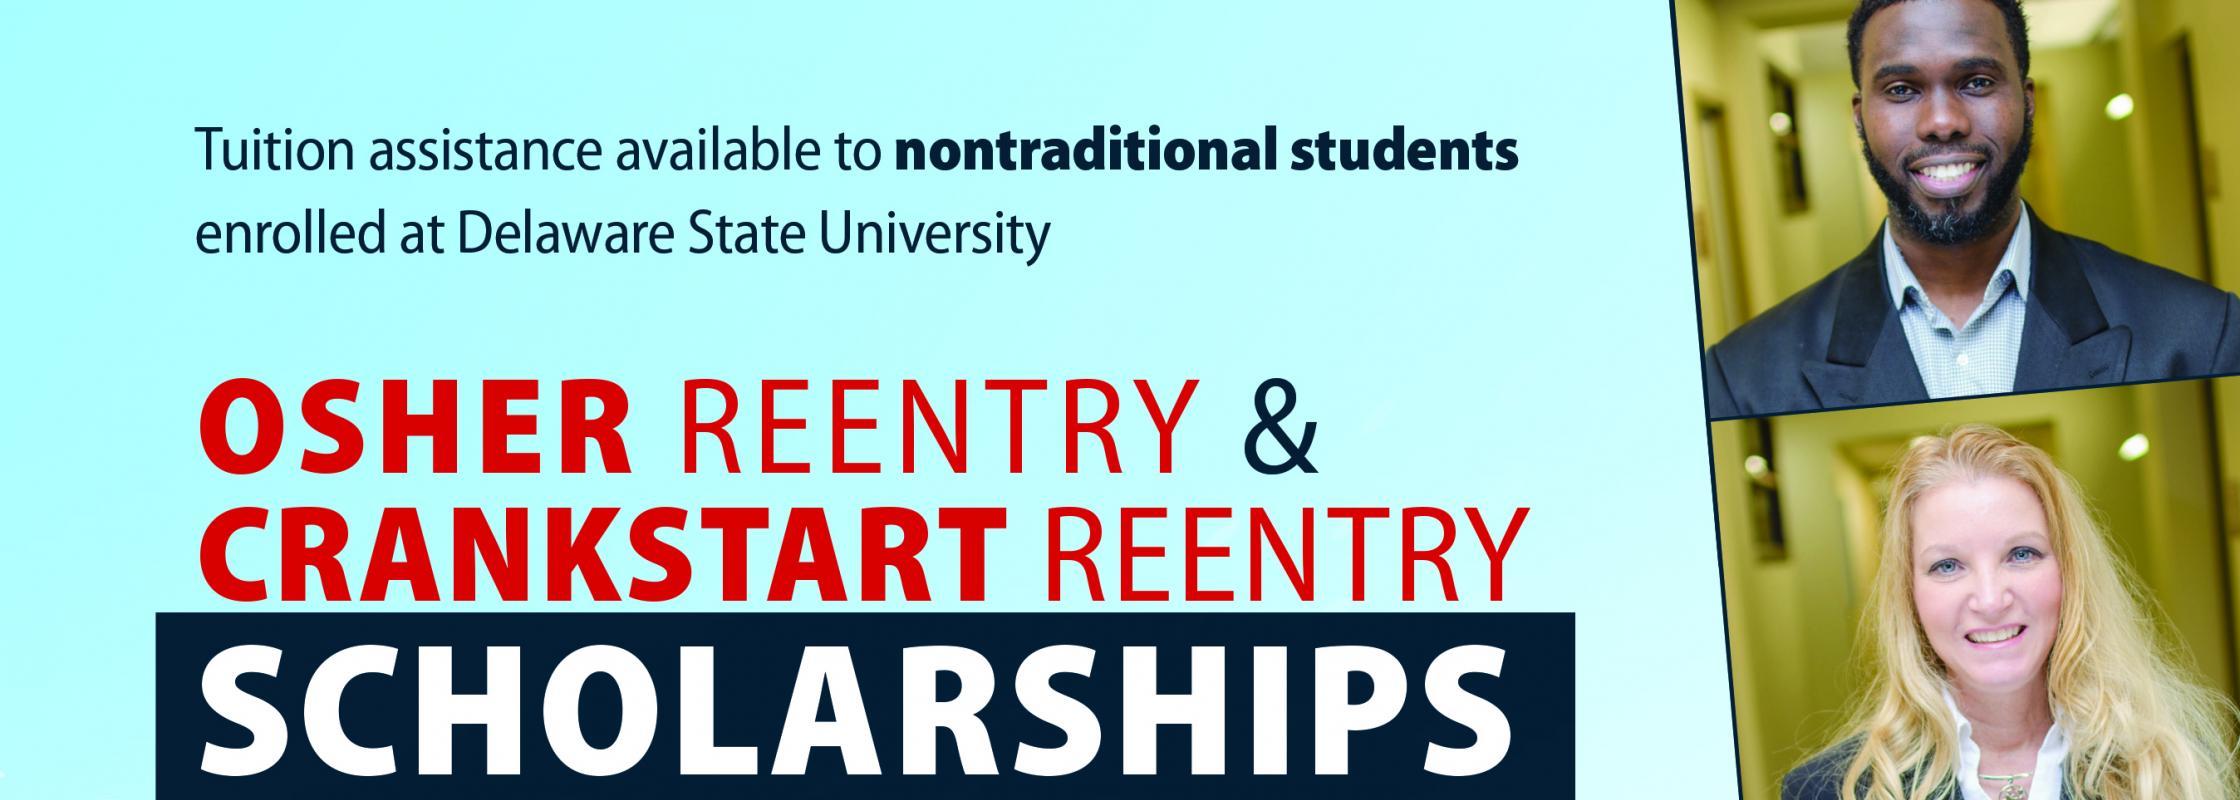 Osher scholarships